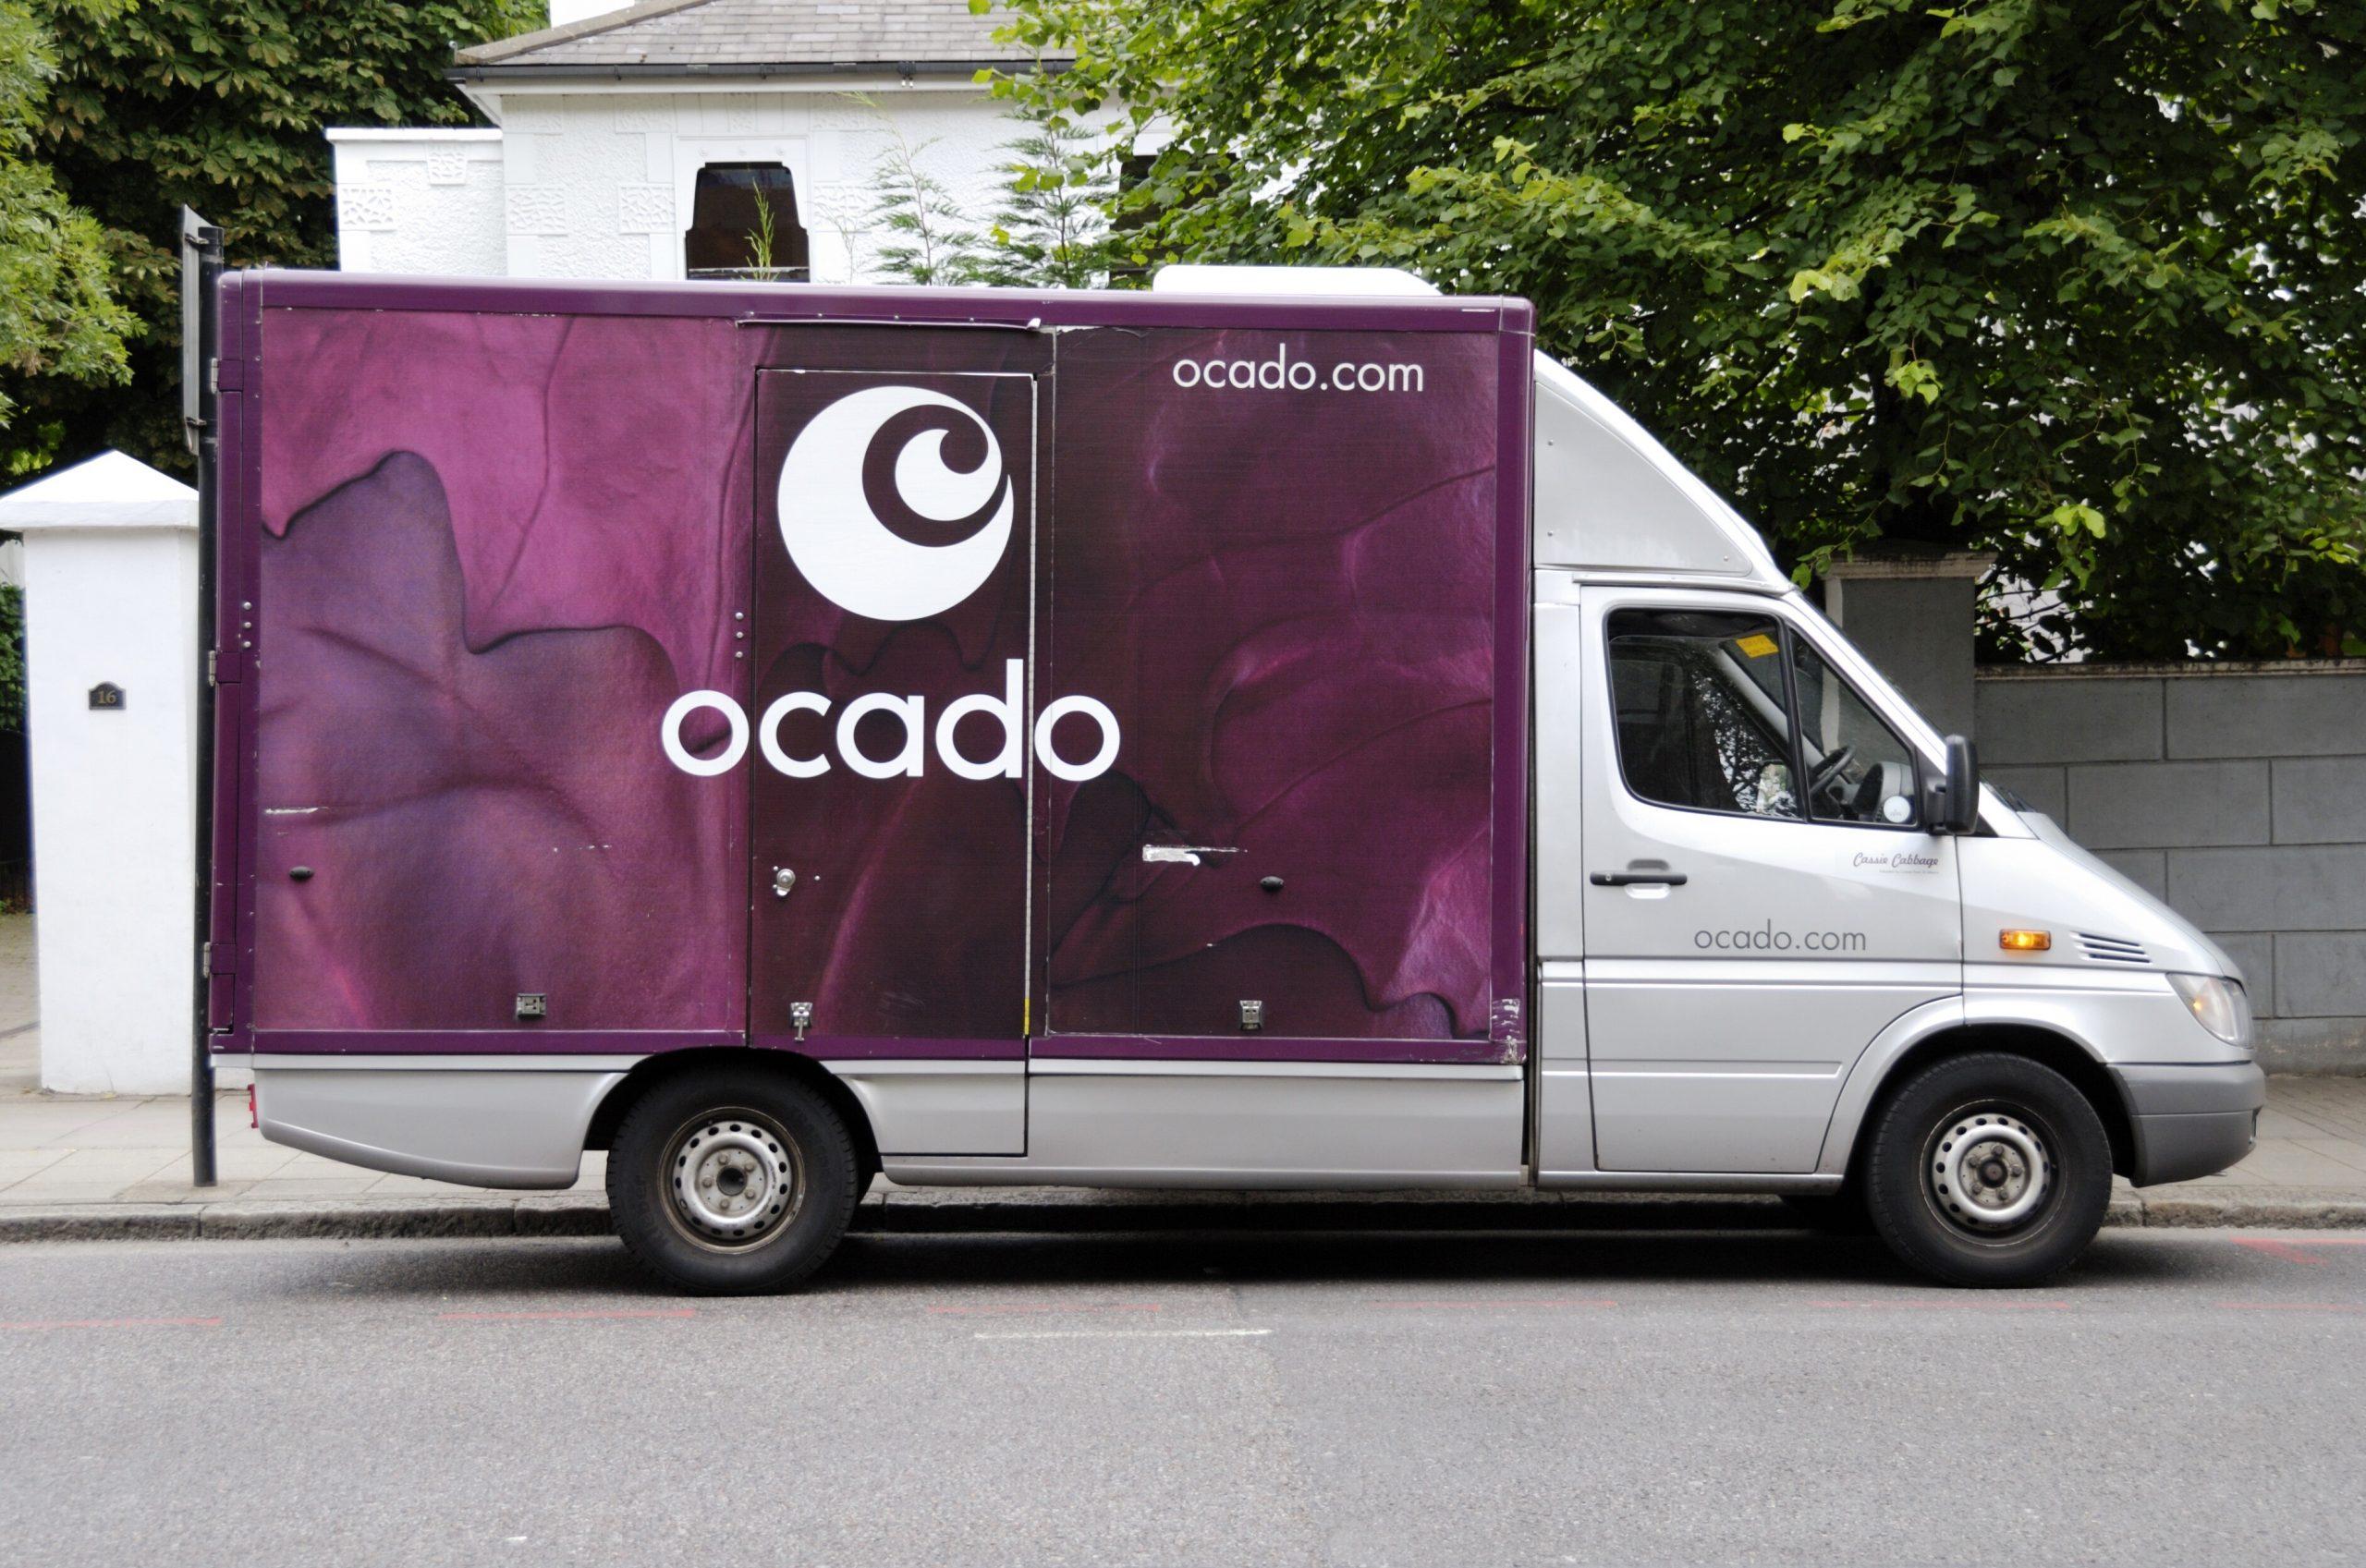 An Ocado van. The company has suspended orders due to coronavirus